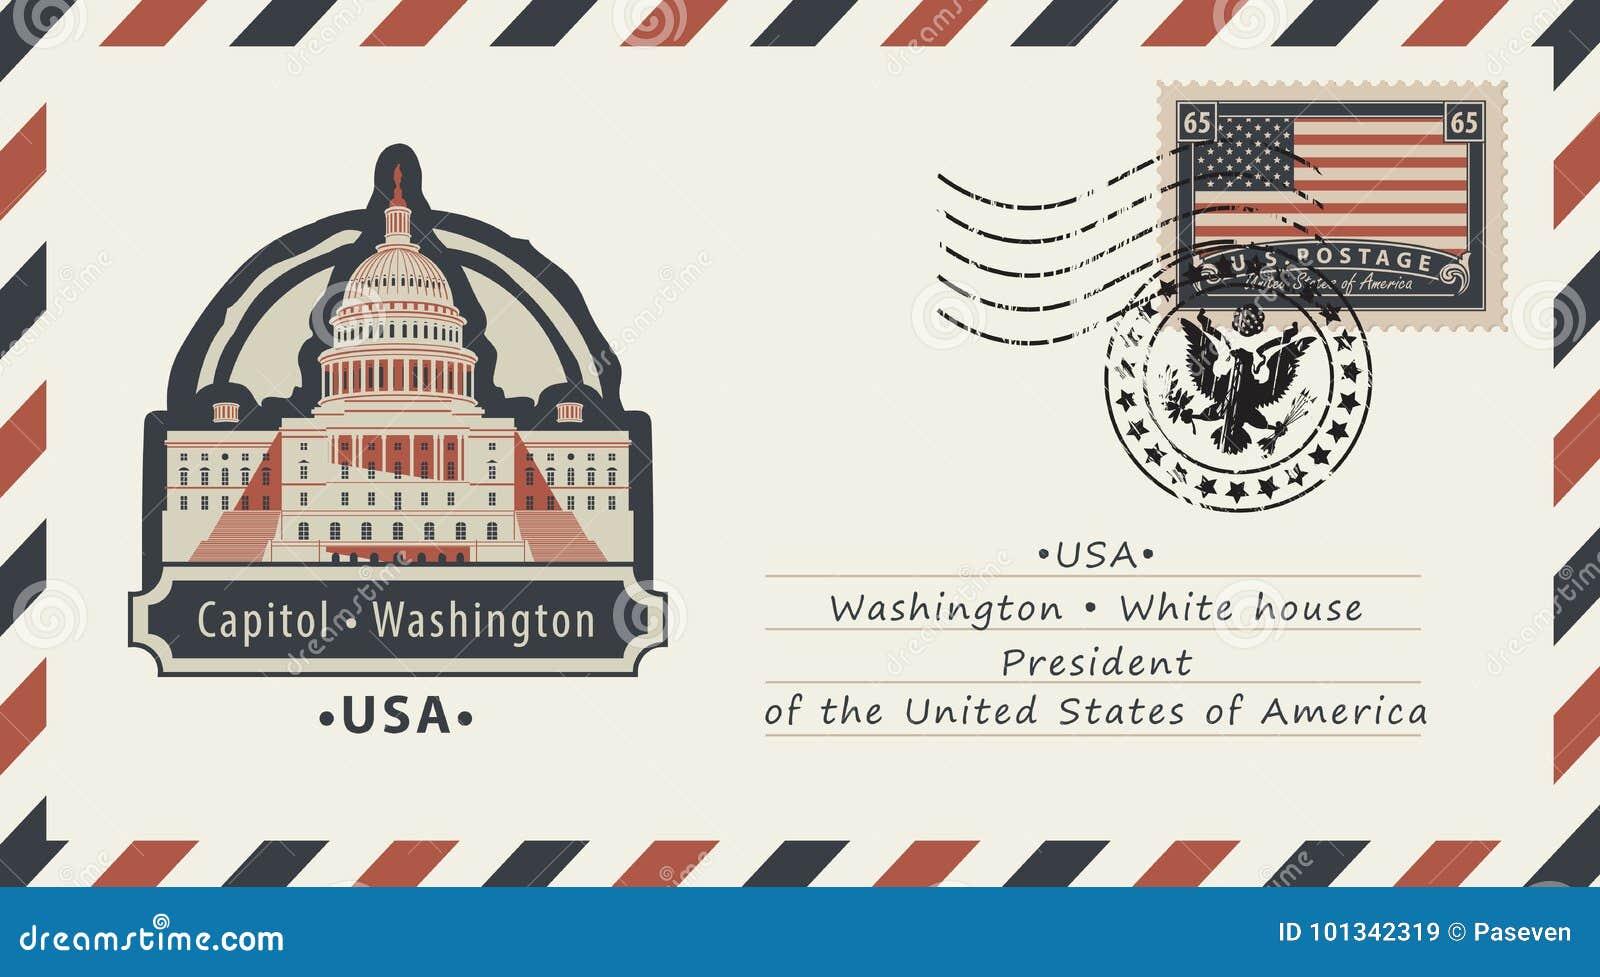 Envelop met Washington Capitol en Amerikaanse vlag